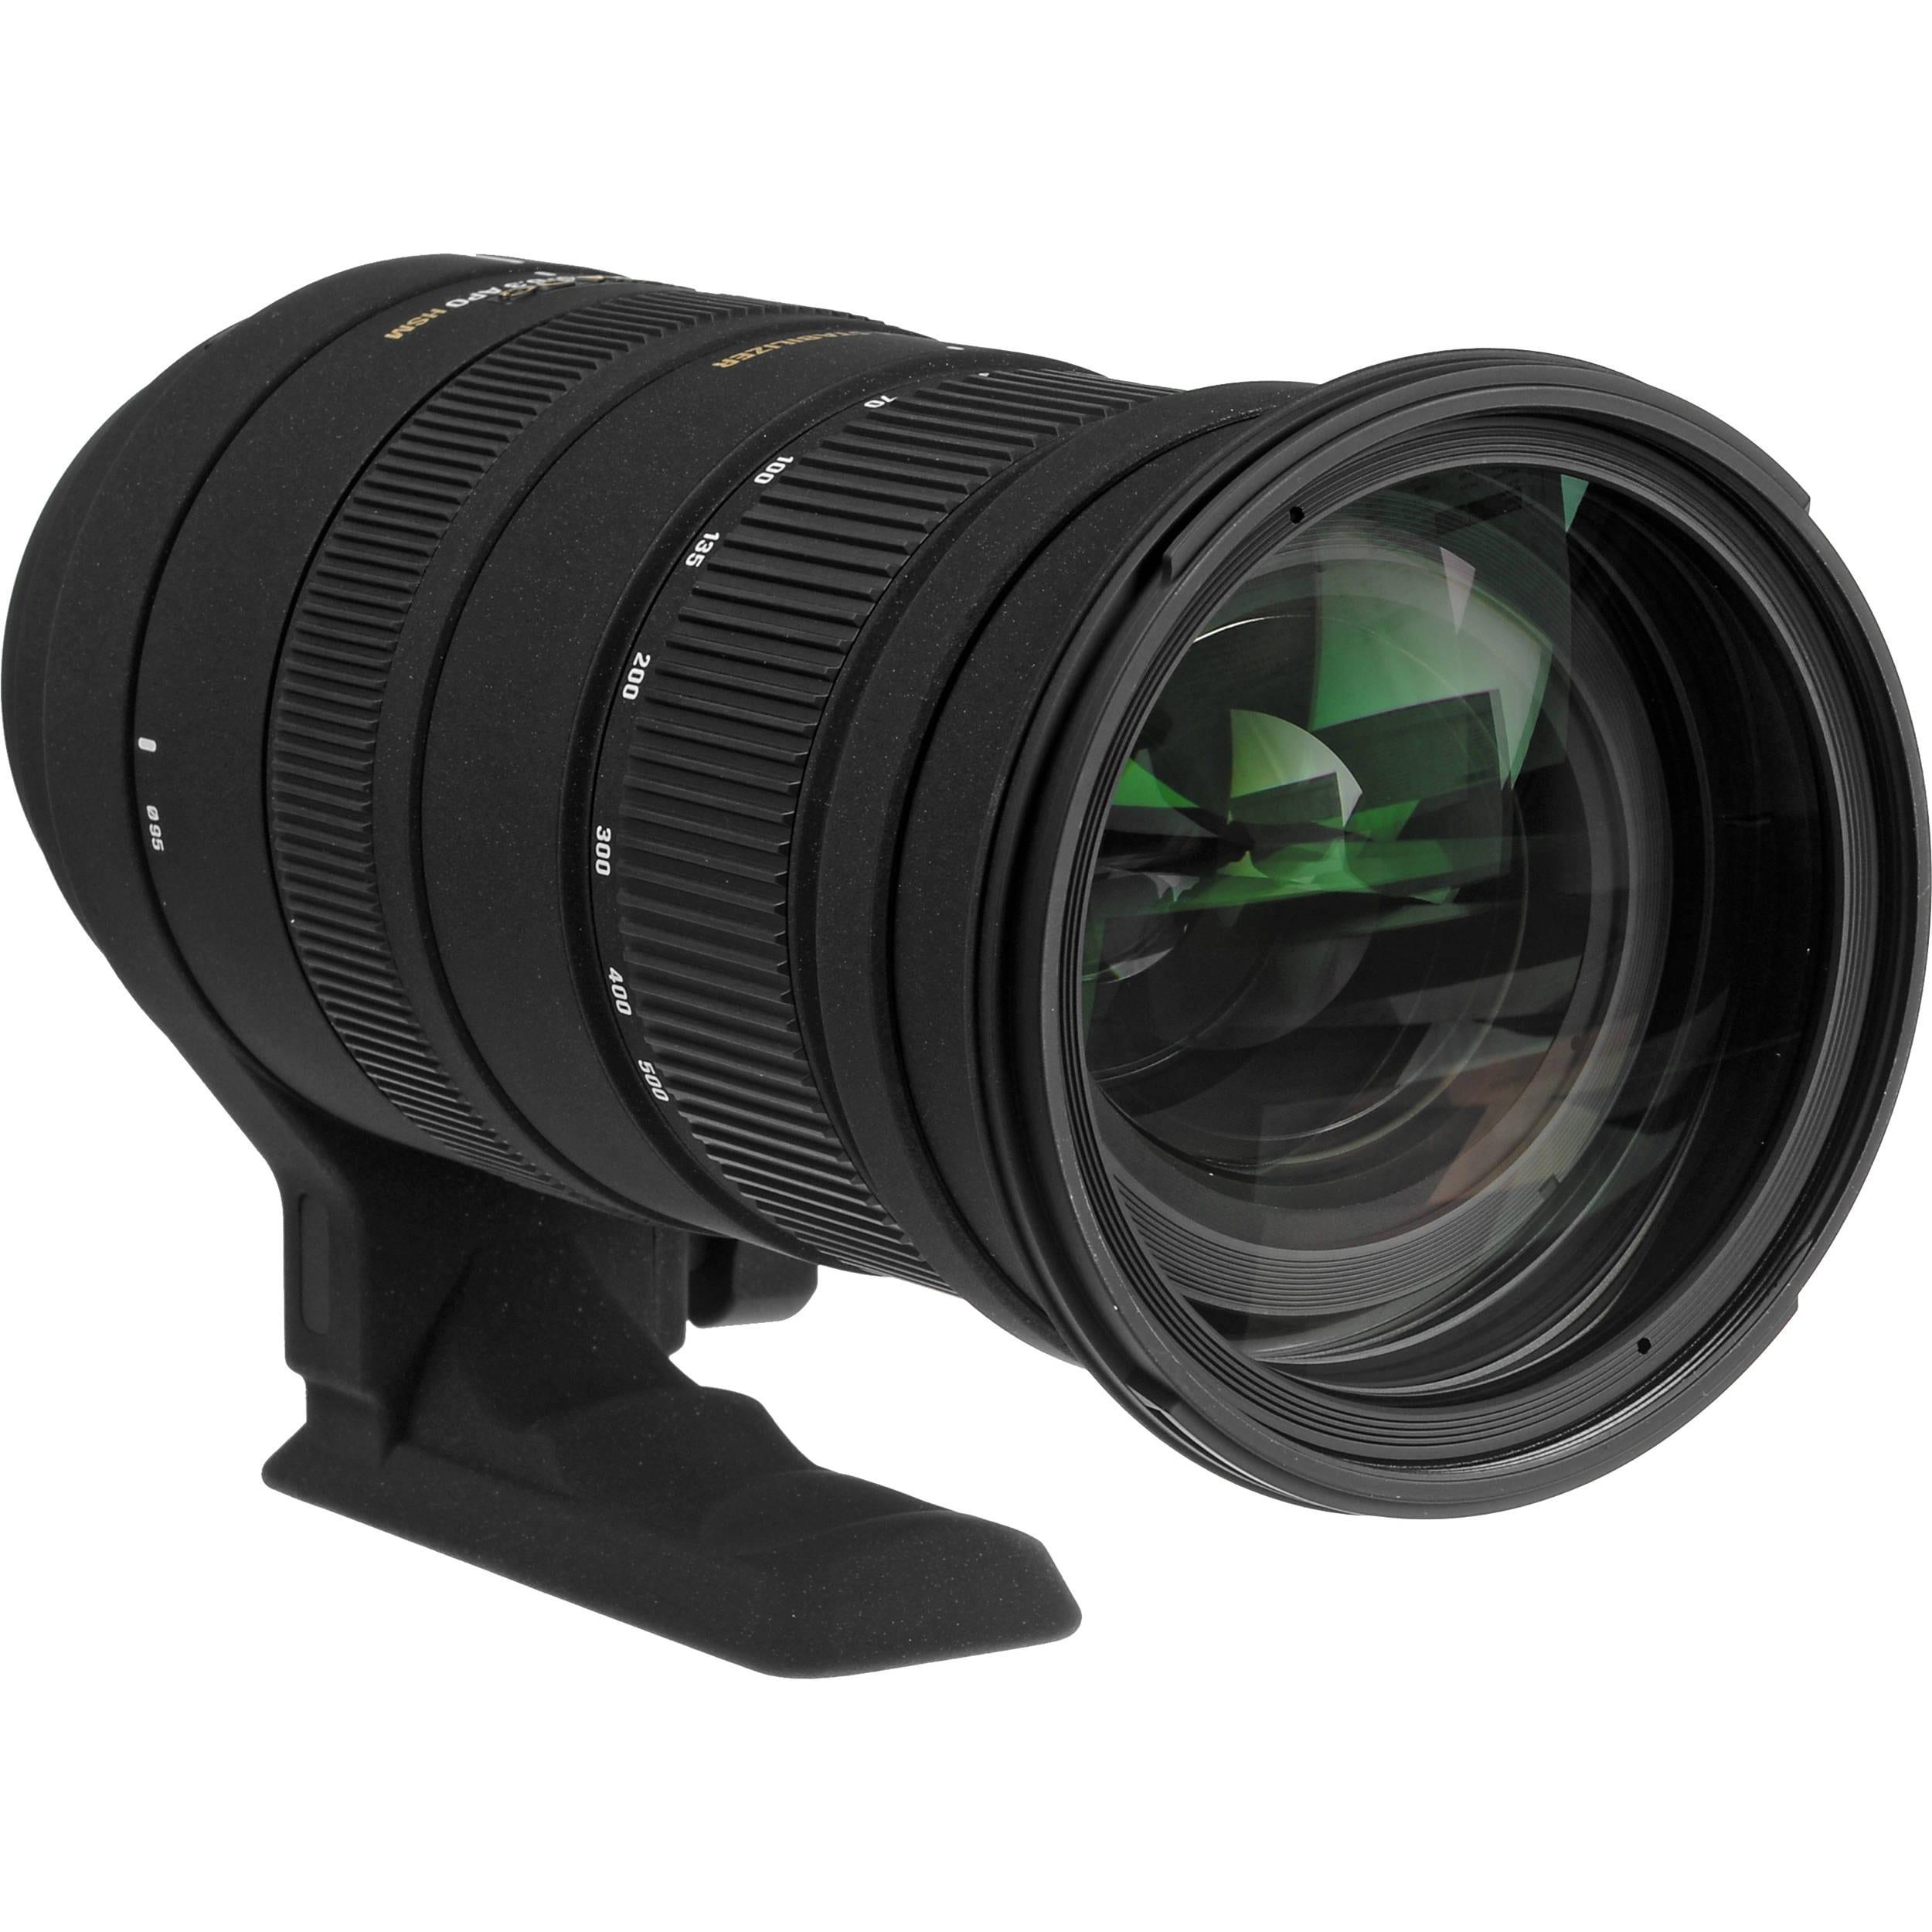 Sigma 50 500mm F 45 63 Apo Dg Os Hsm Lens For Nikon International 70 300mm 4 56 Model Free Shipping Today 26323670